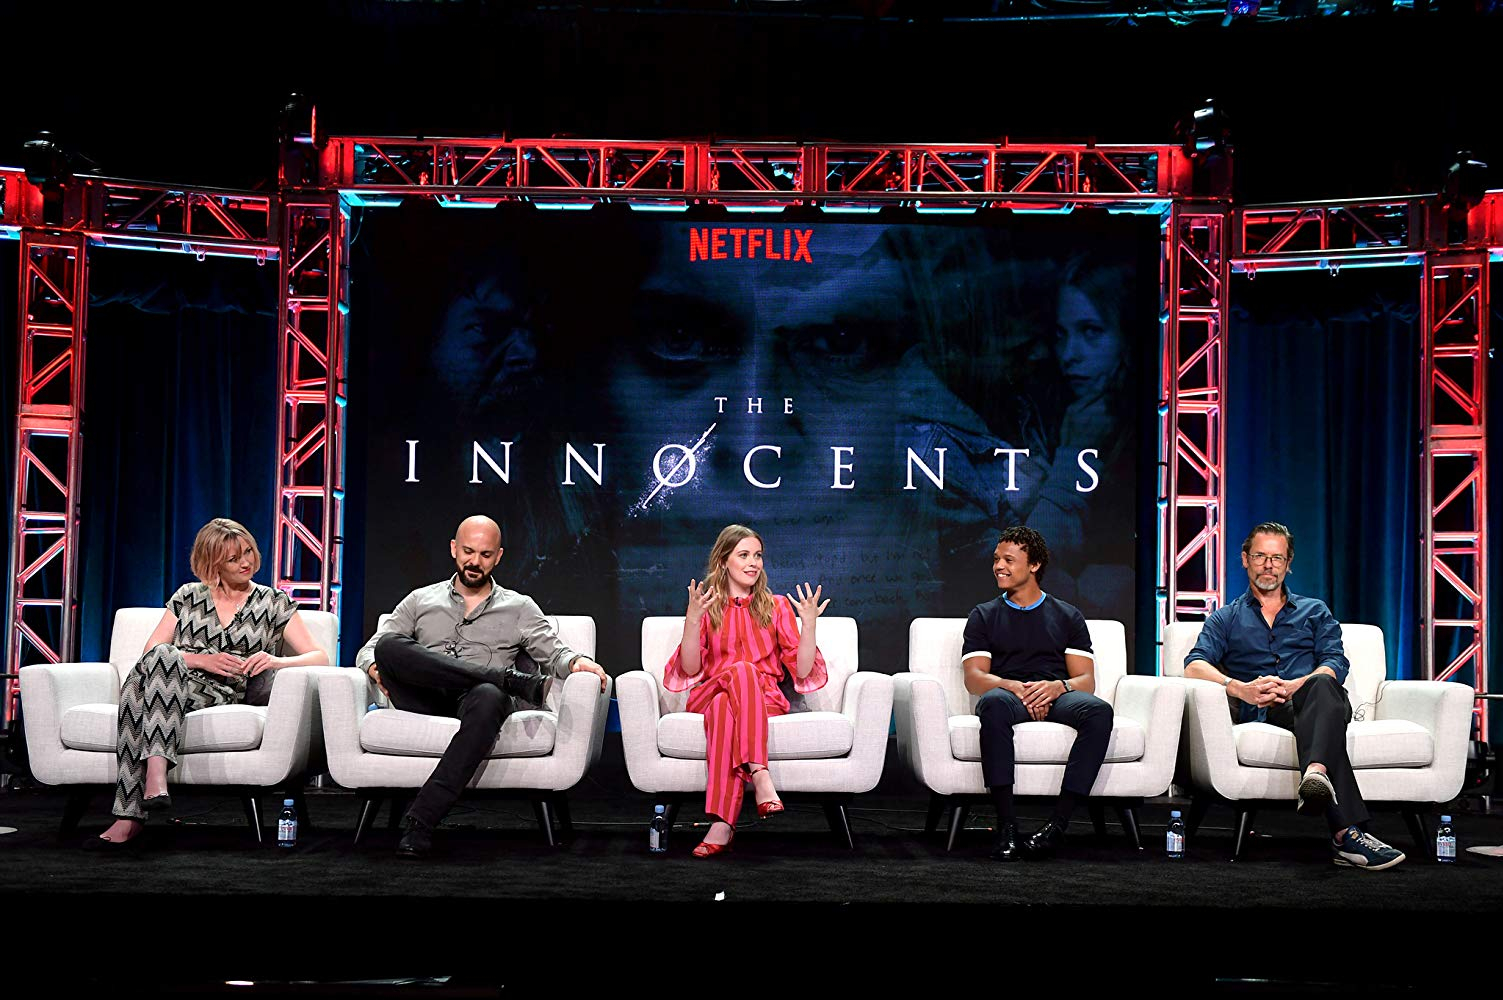 The Innocents - Season 1